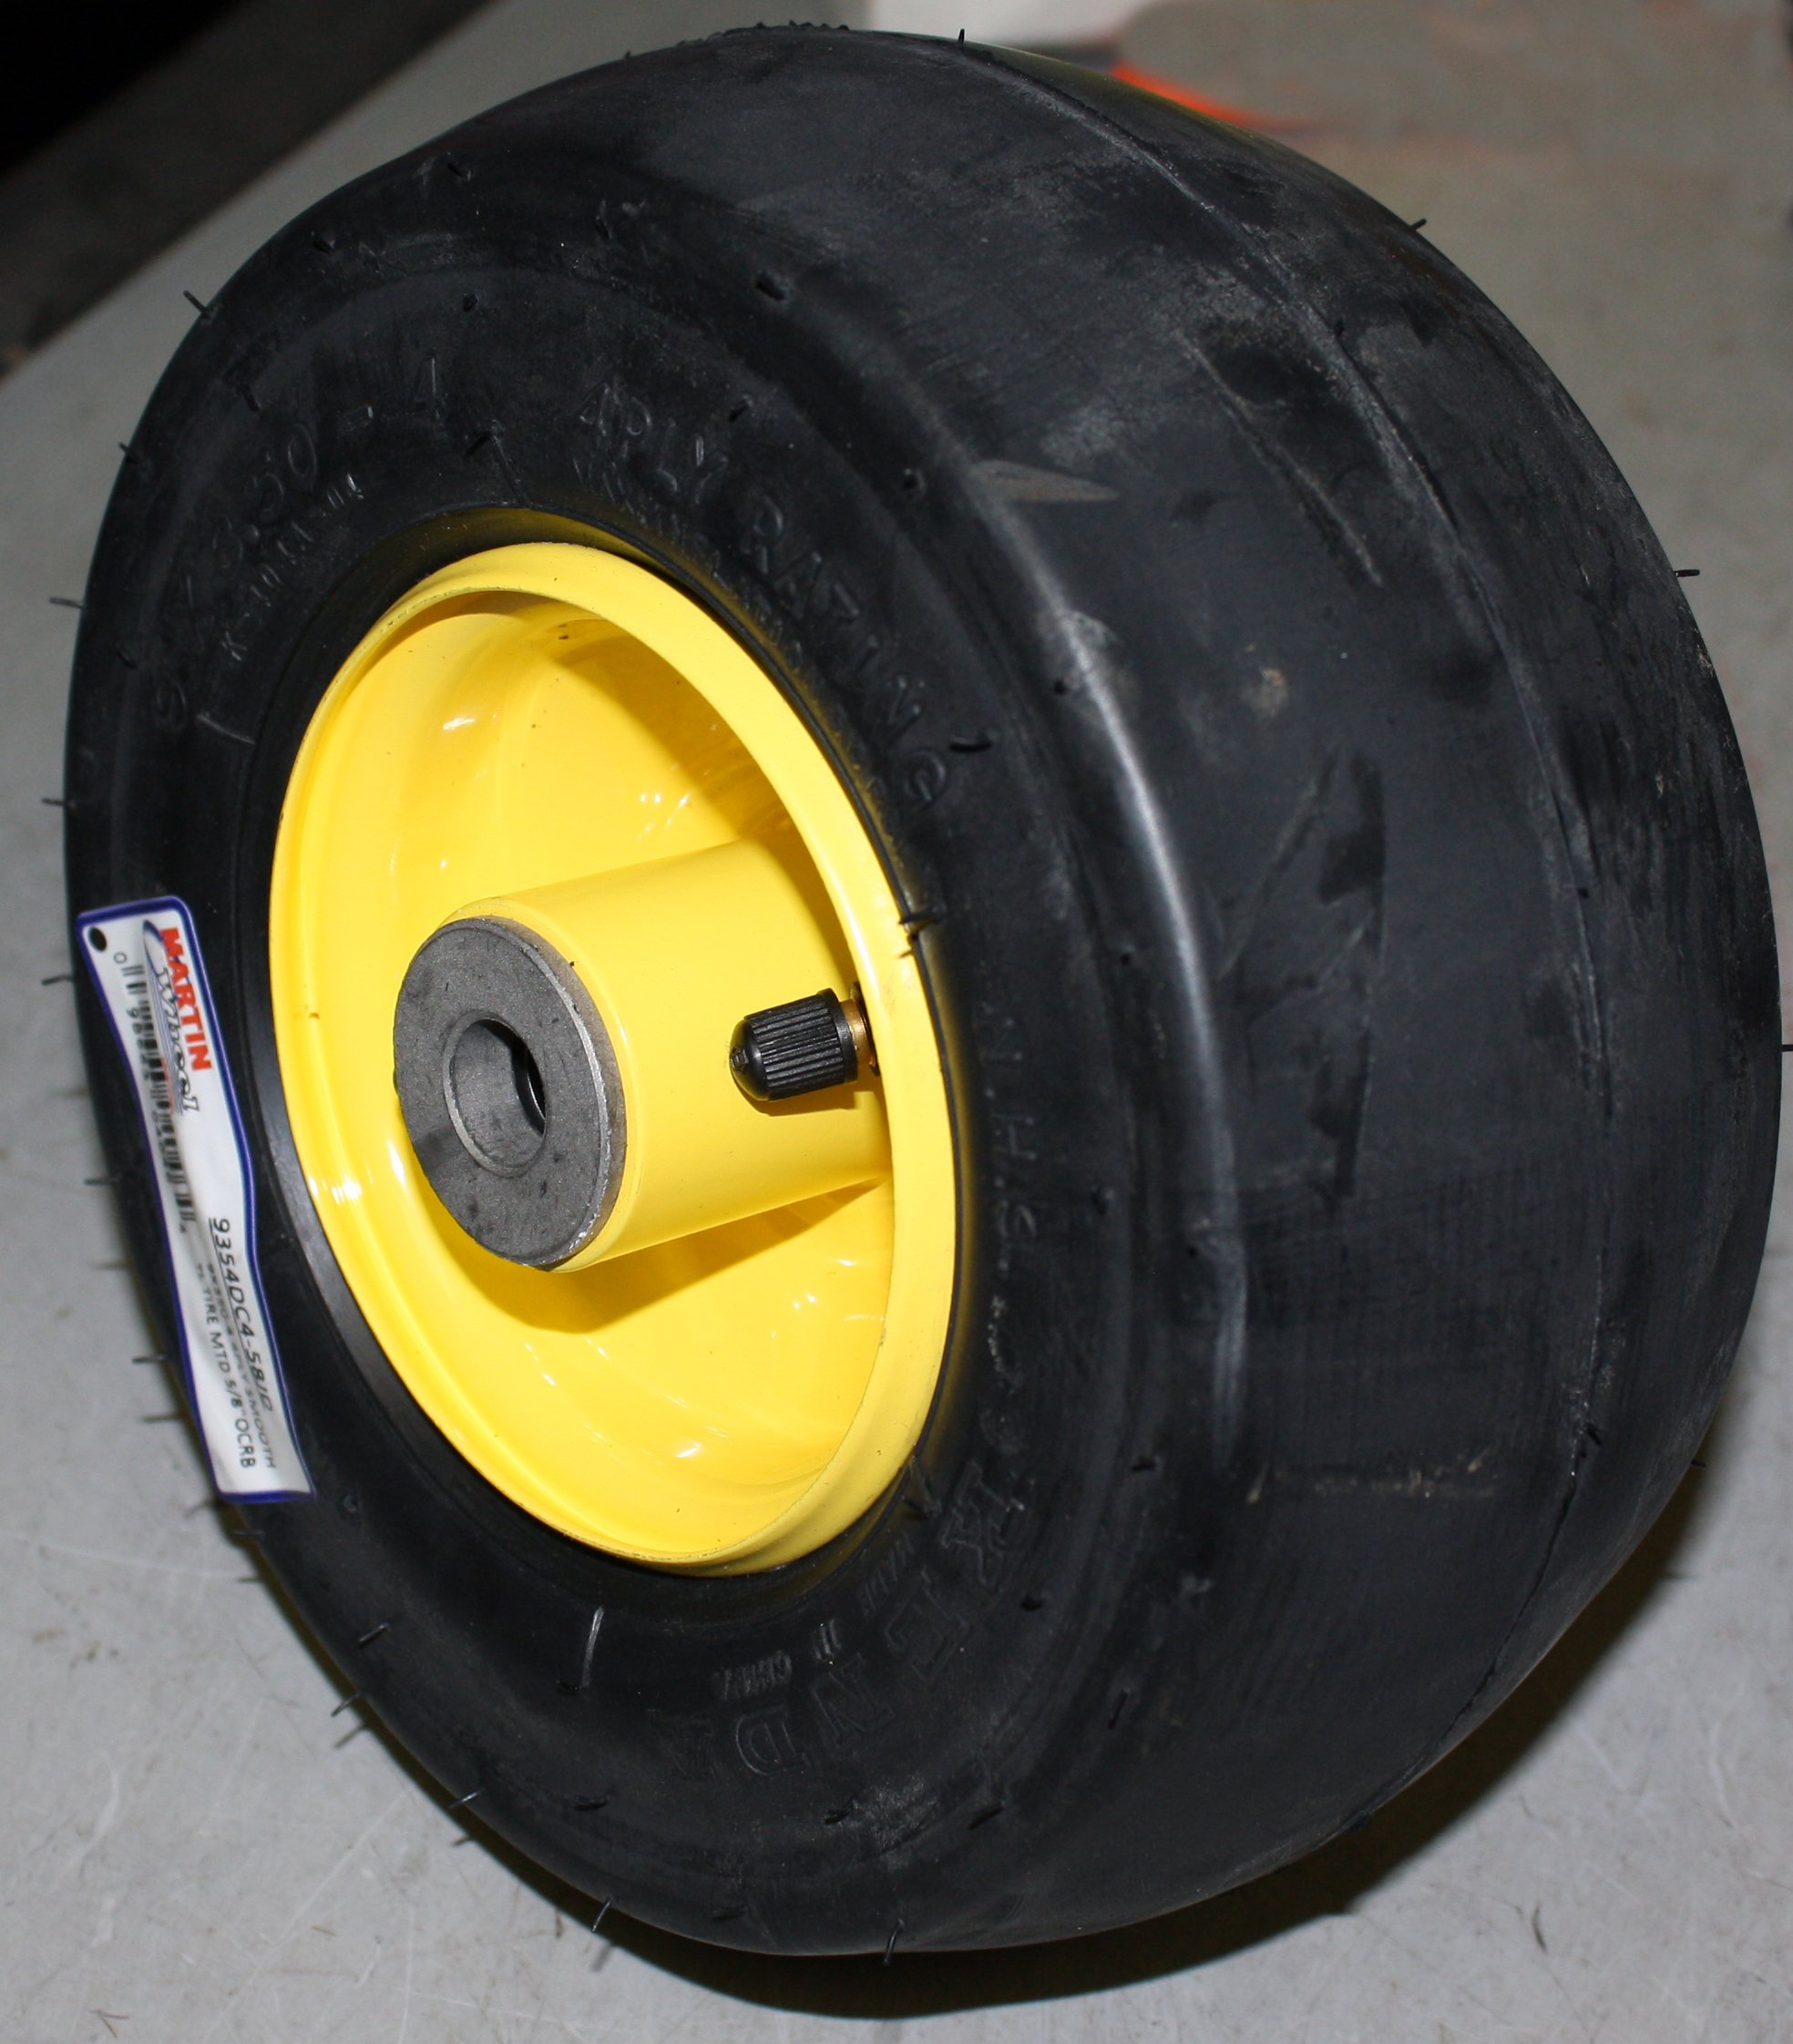 Martin Wheel 9x3.50-4 Kenda 4 ply Tubeless Tire Rim Assembly 5/8'' ORCB 3 3/4'' Hub Length